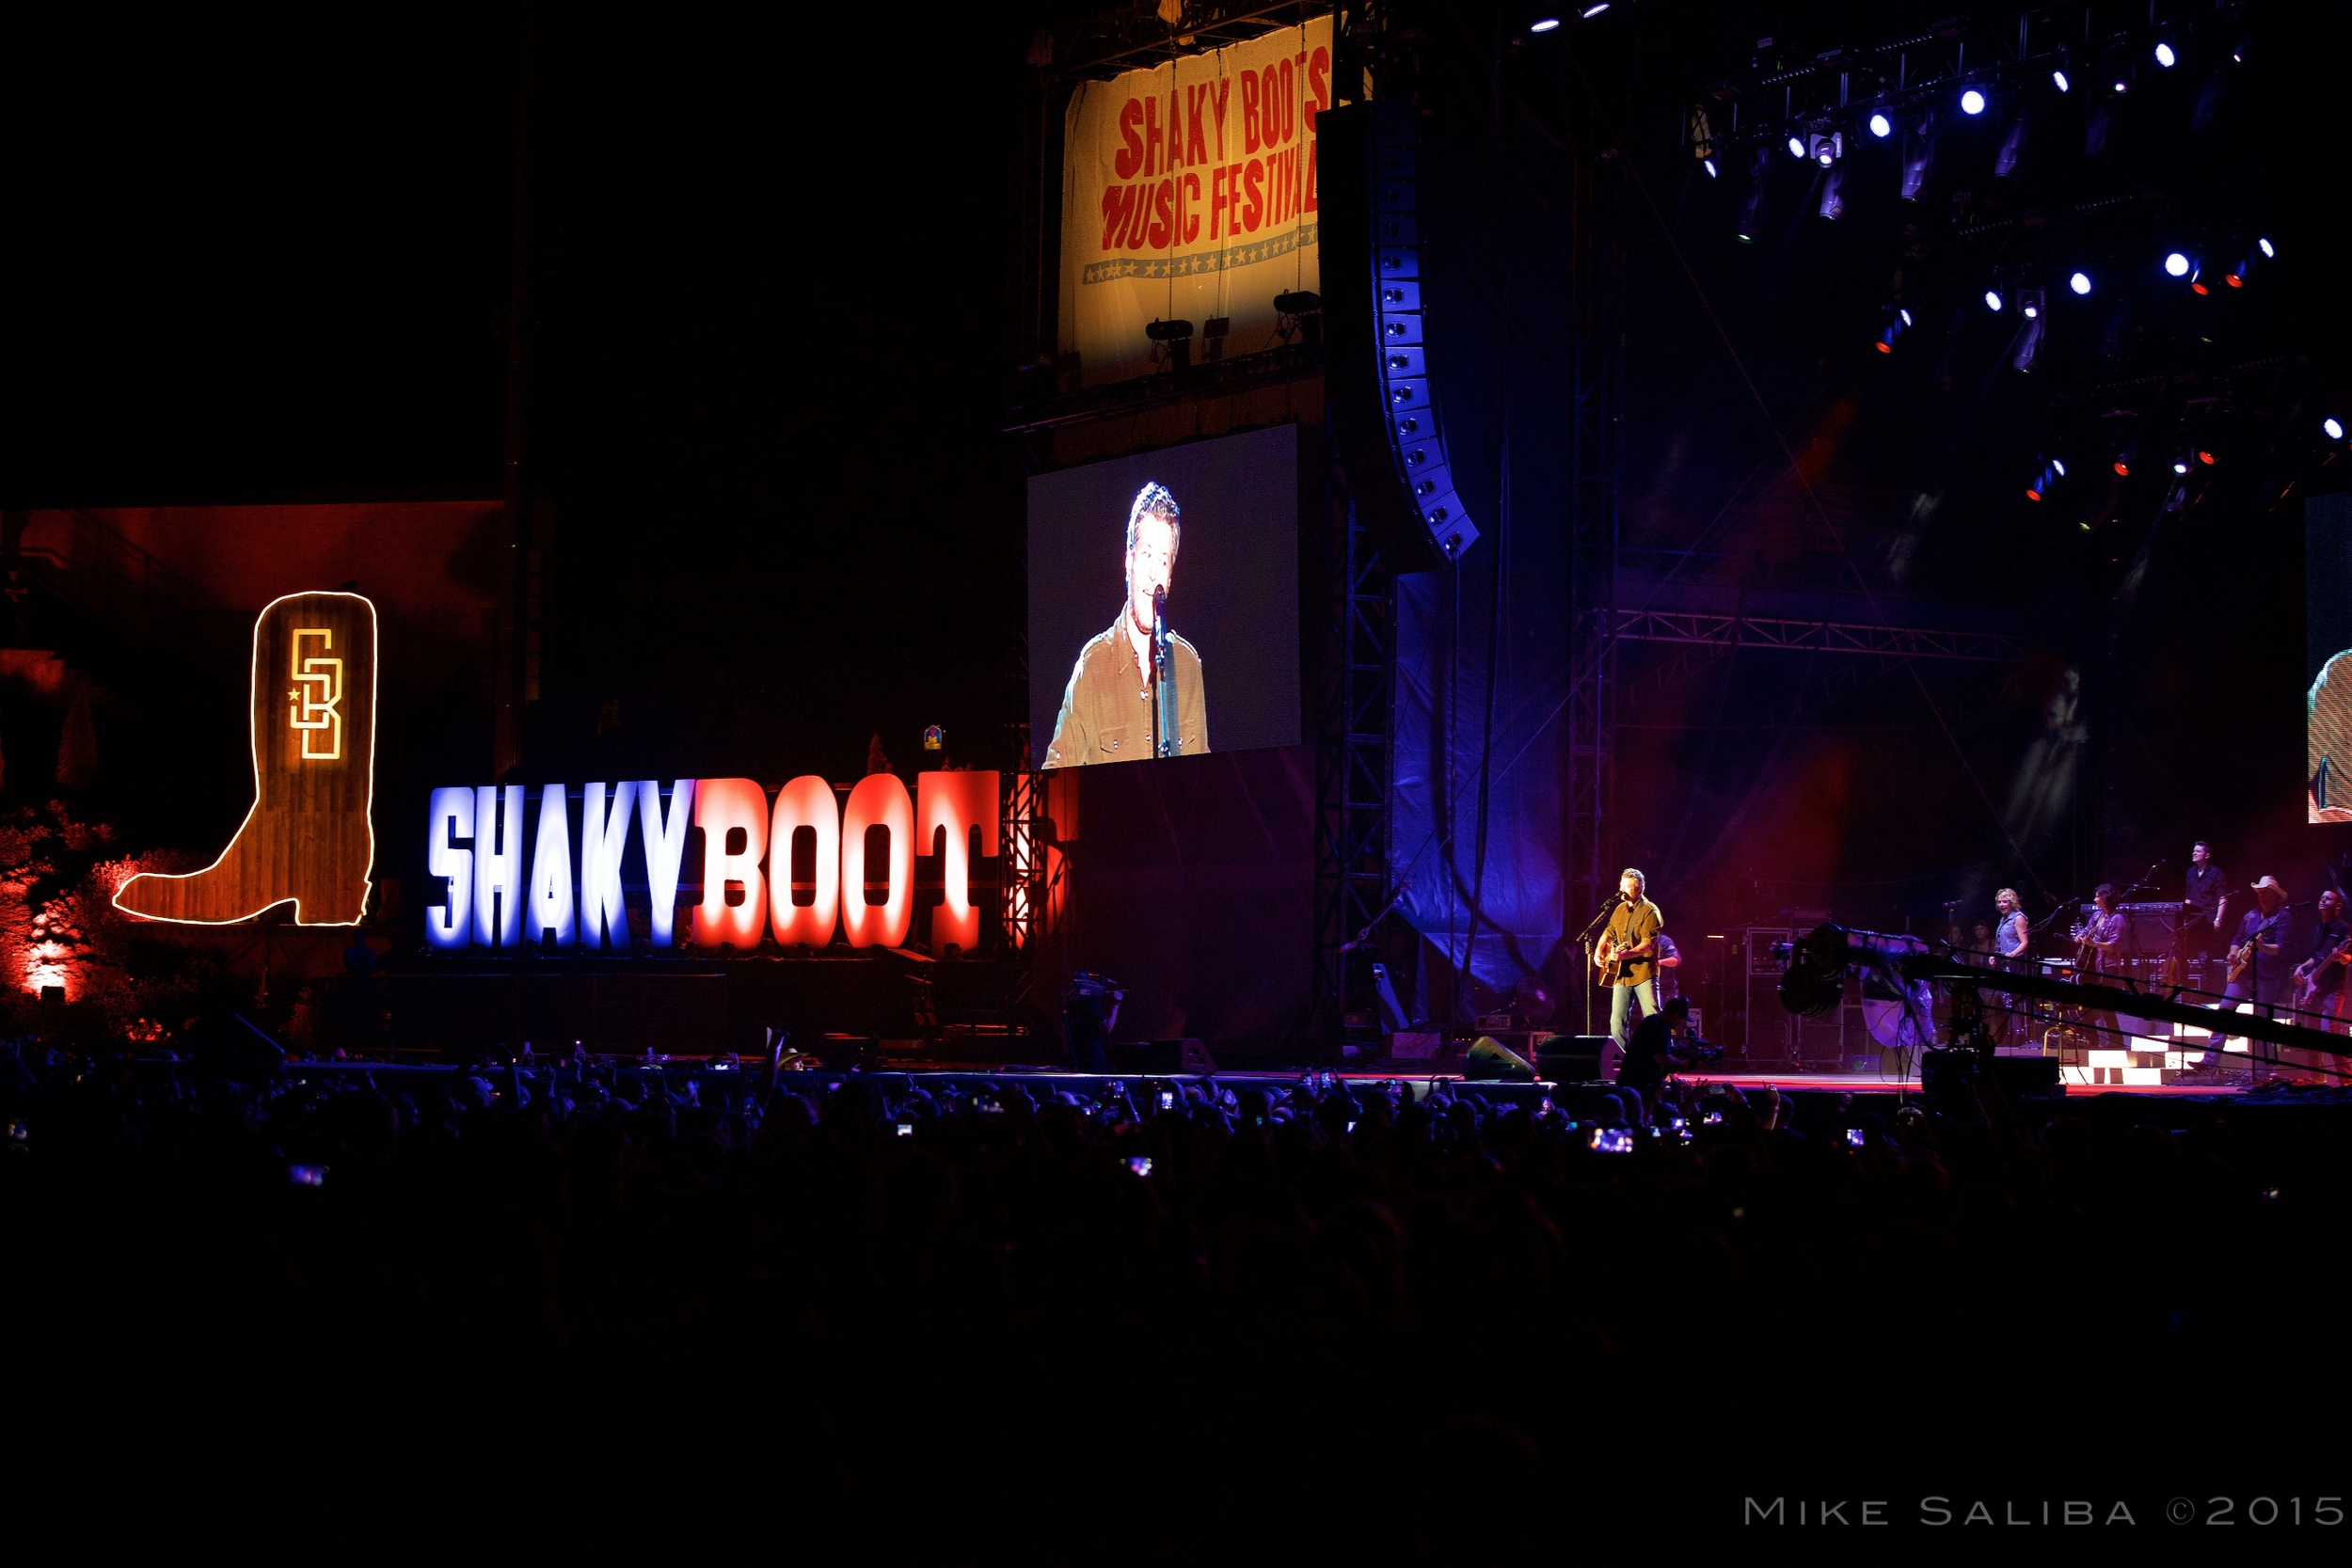 Blake Shelton - Shaky Boots 2015